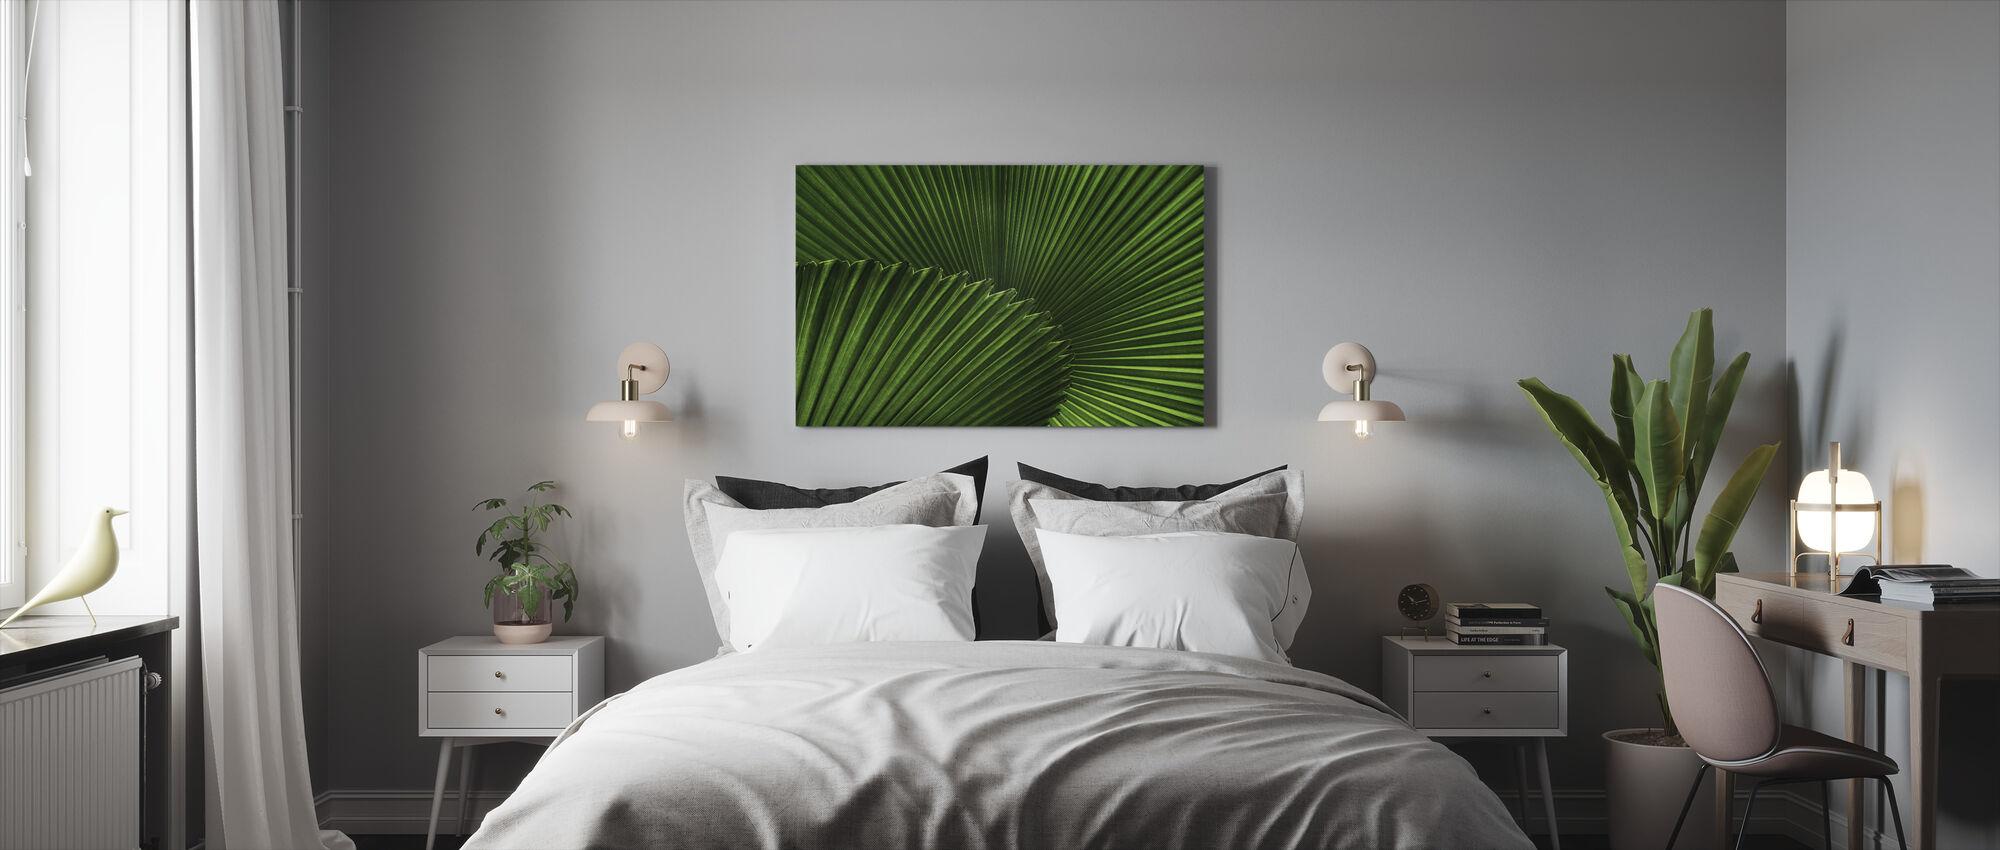 Vifter Palm blader - Lerretsbilde - Soverom